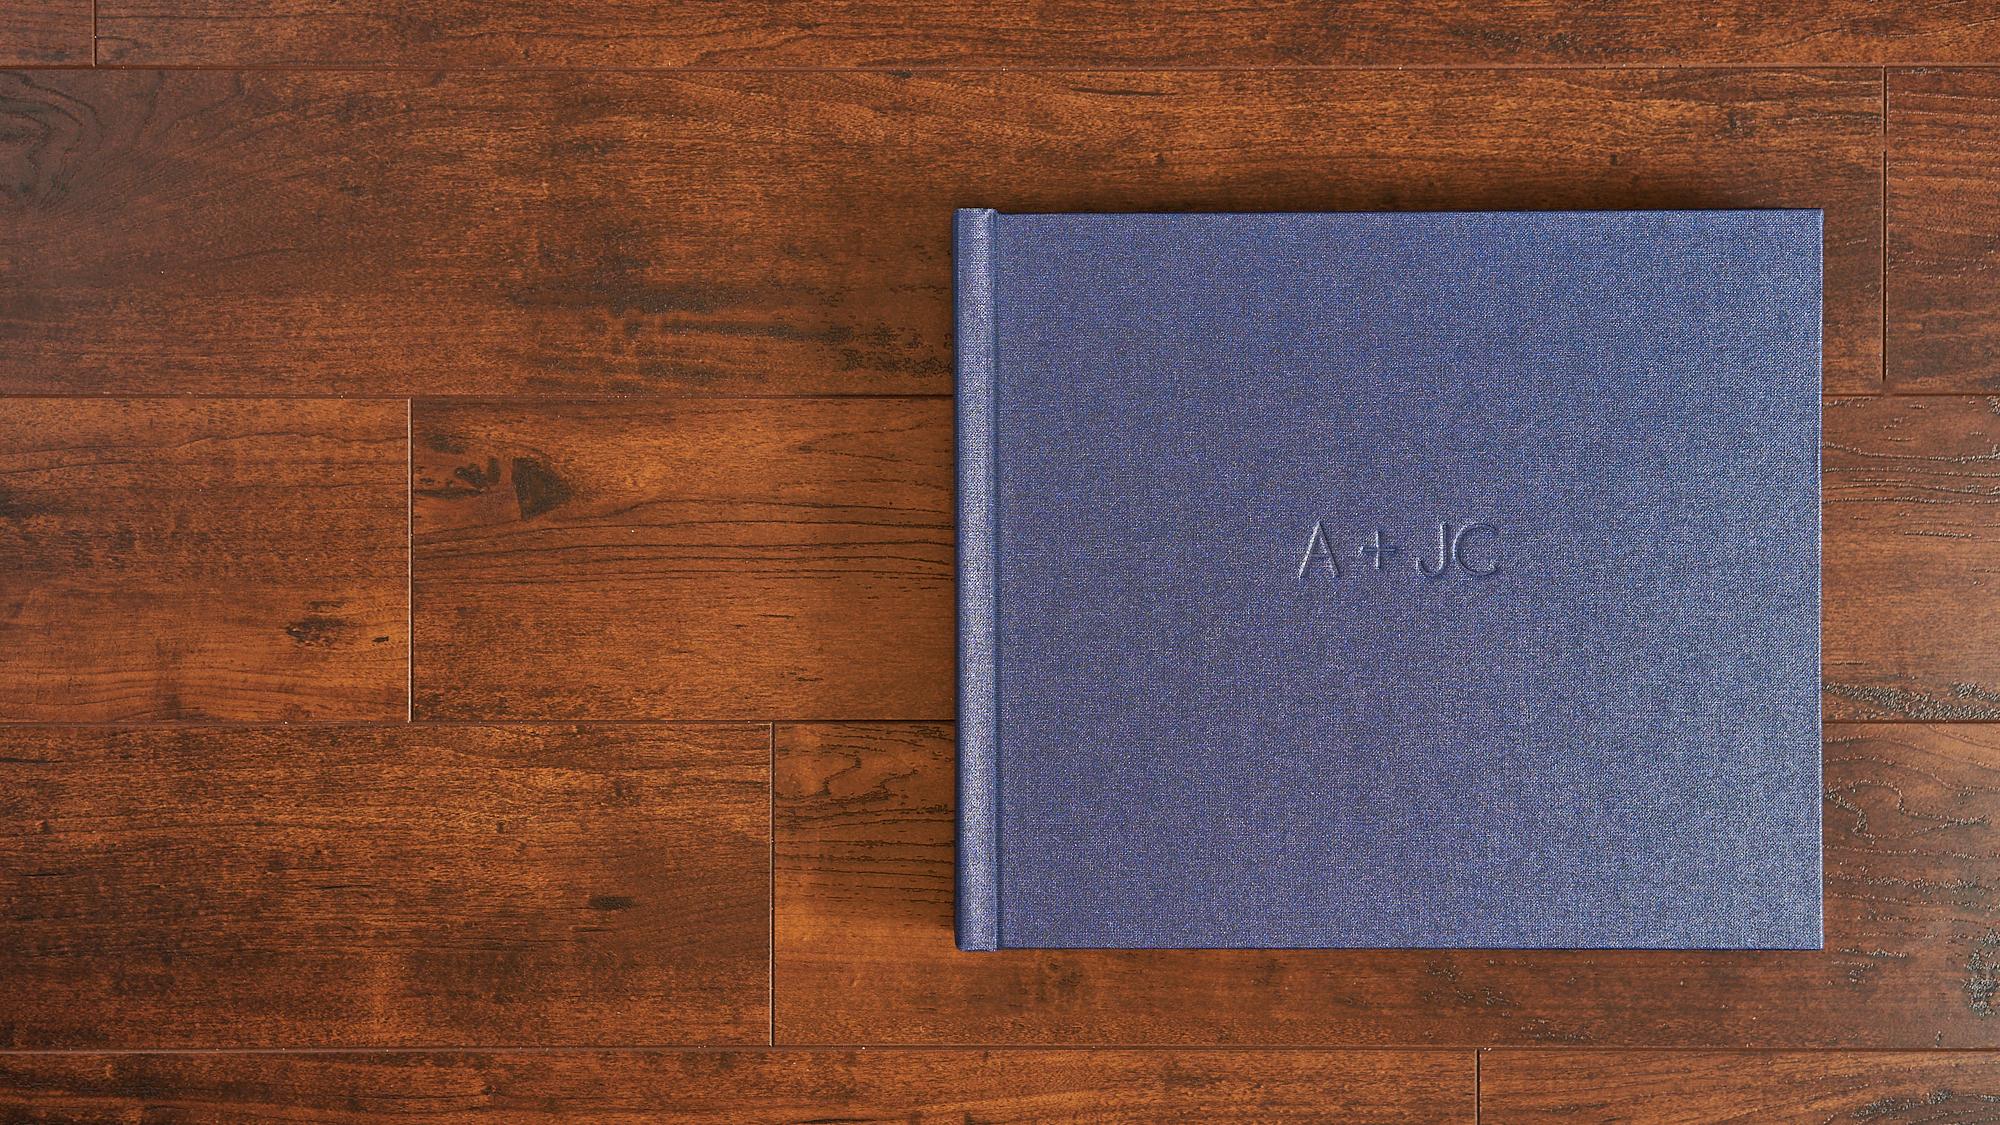 Anita&JC-Album 0003.jpg